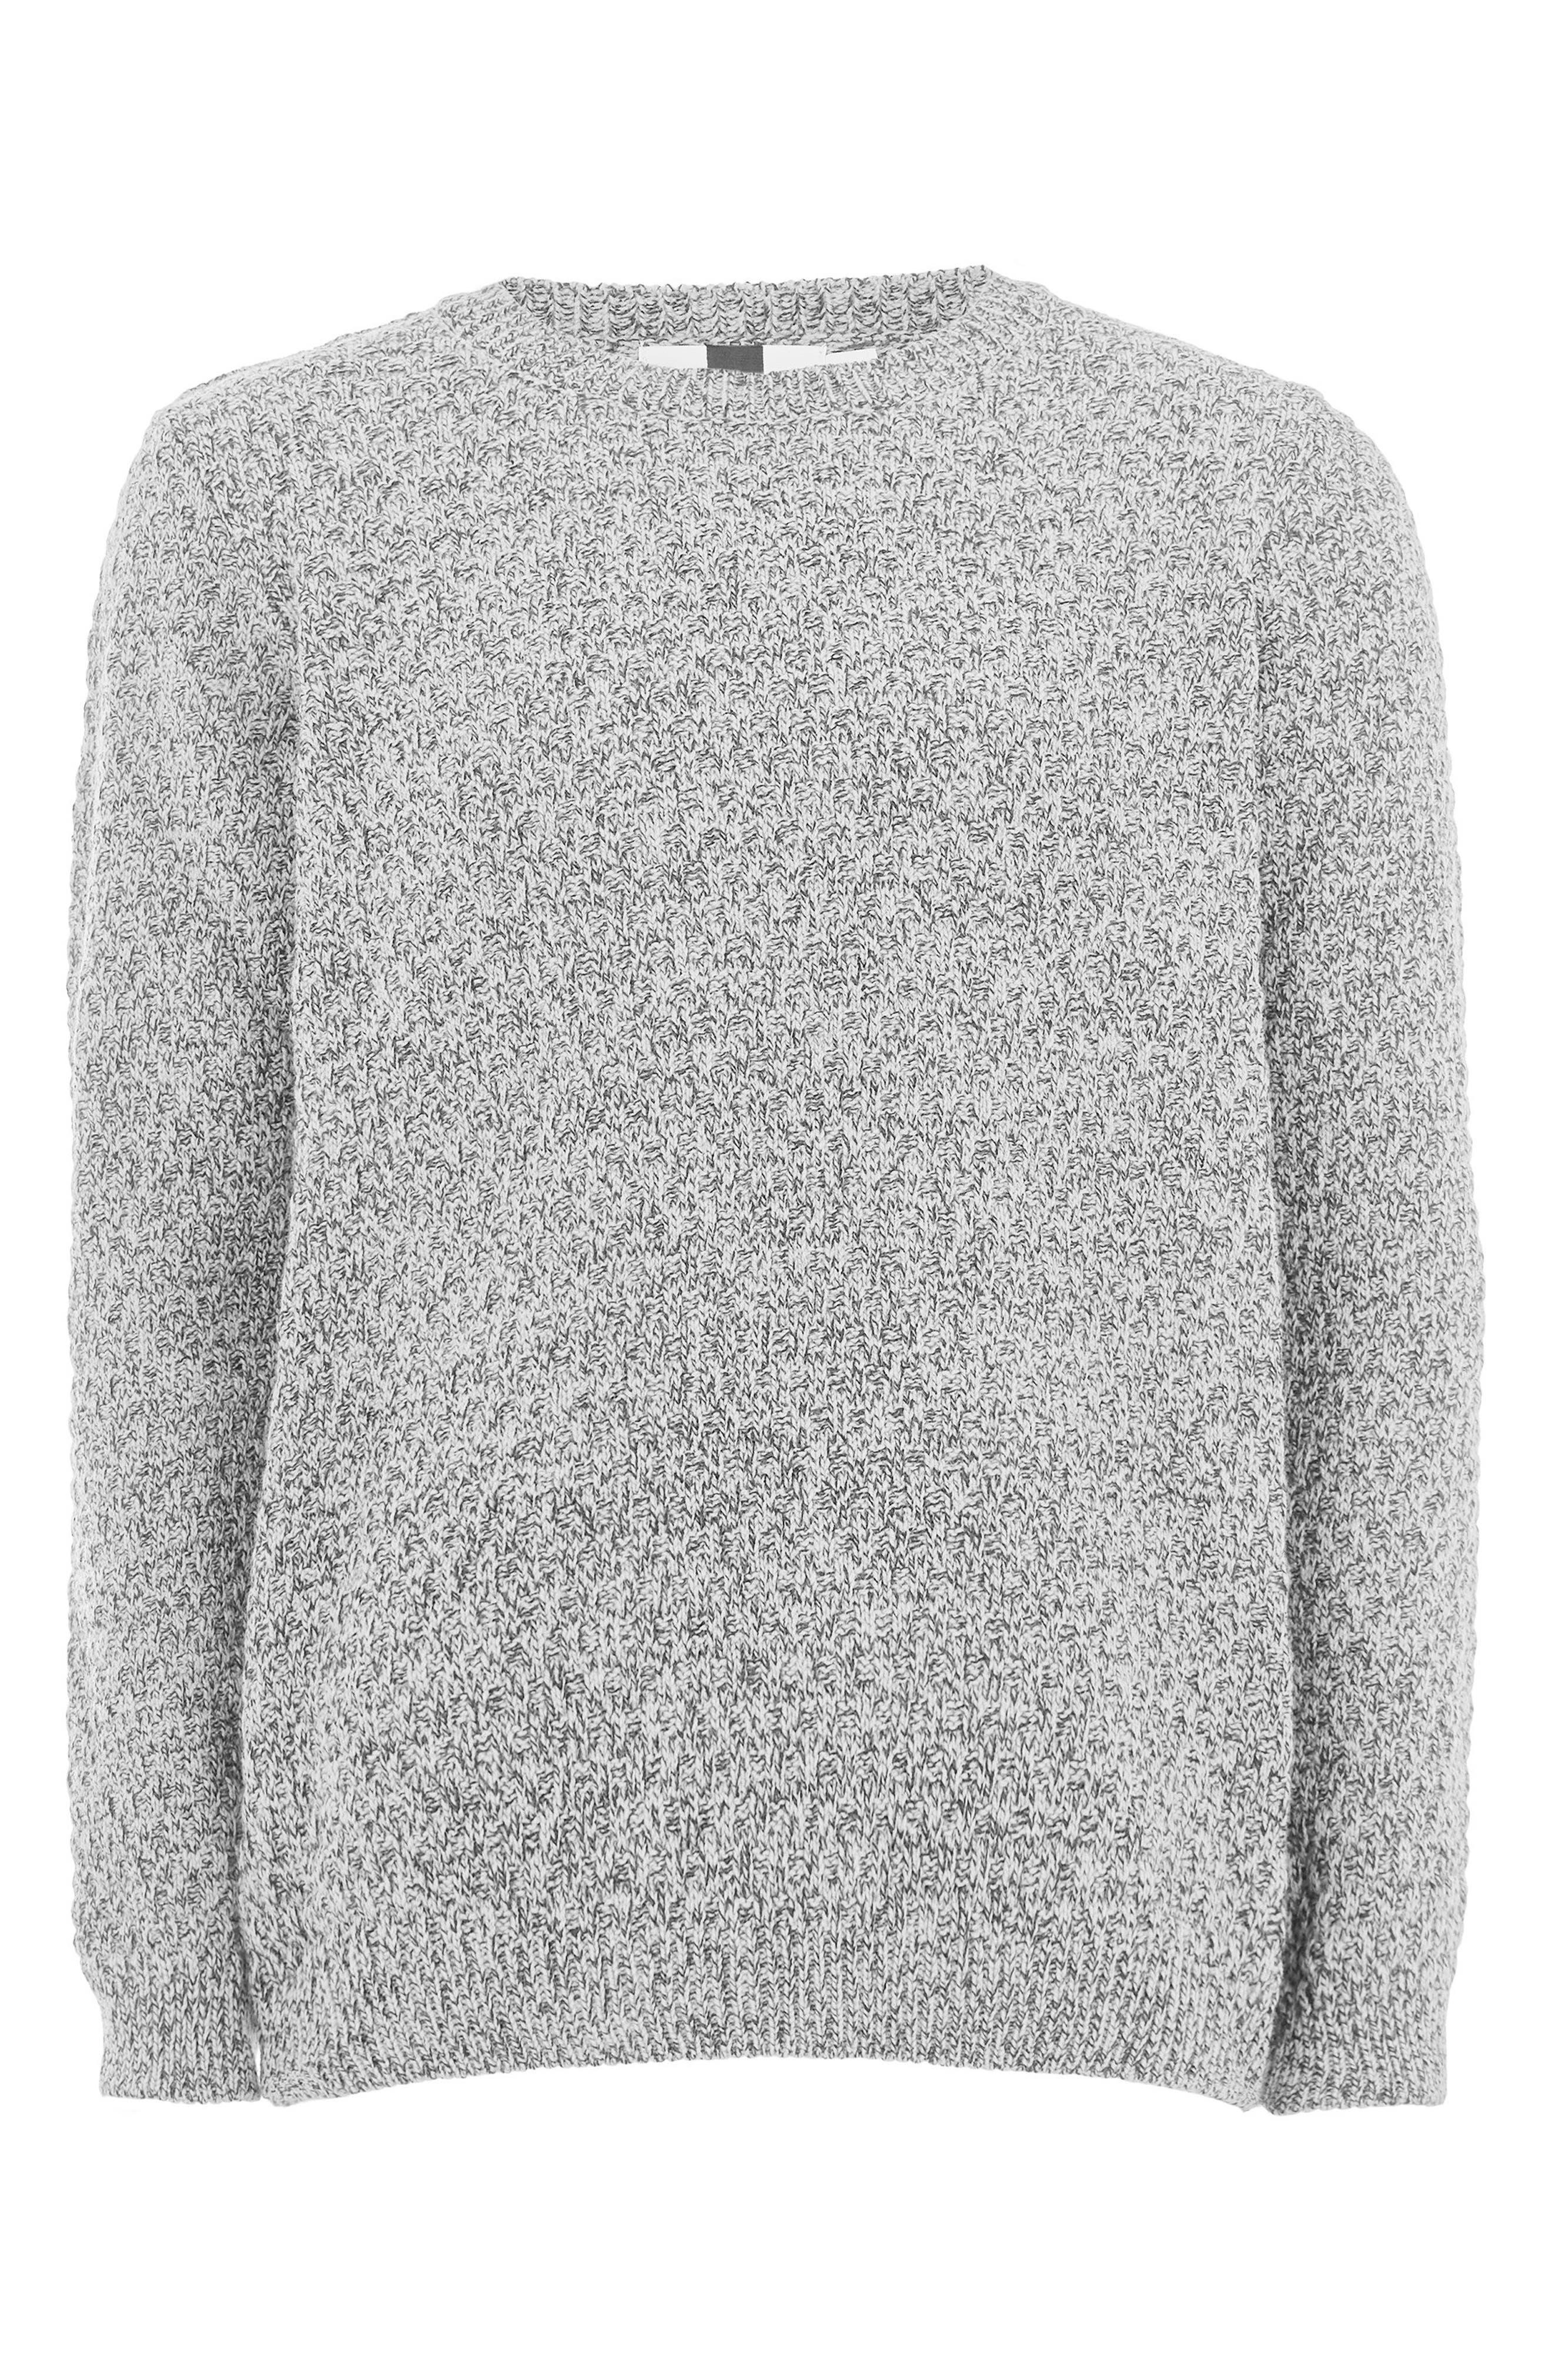 Textured Crewneck Sweater,                             Alternate thumbnail 4, color,                             020